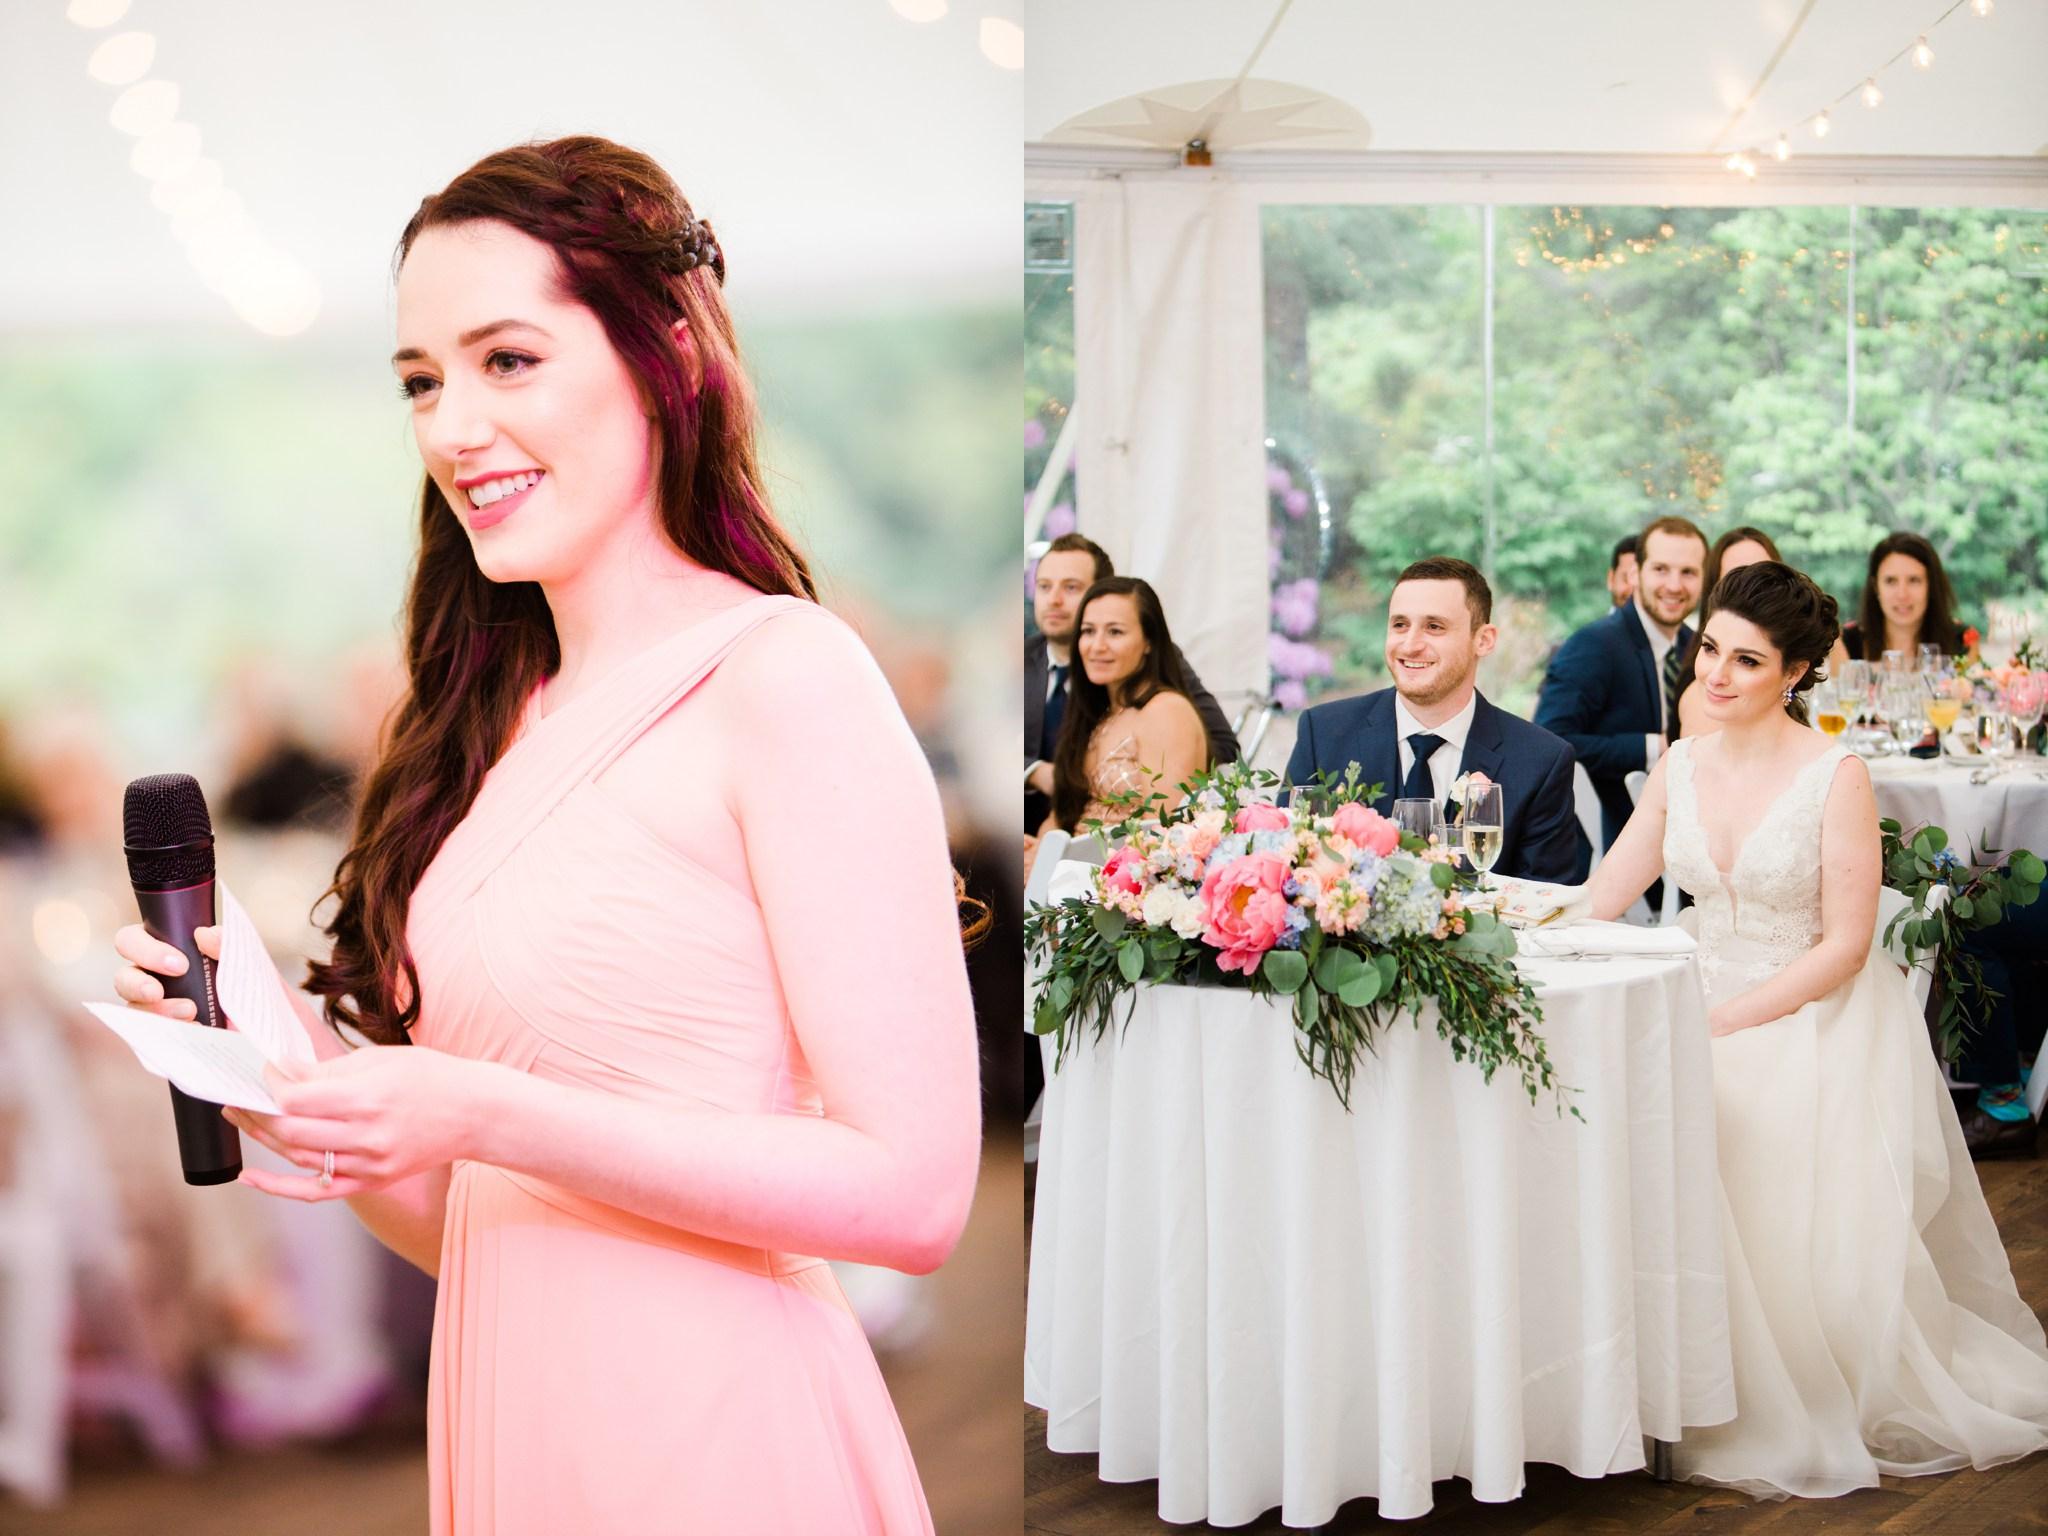 estate_moraine_farm_wedding_photos_deborah_zoe_00100.JPG